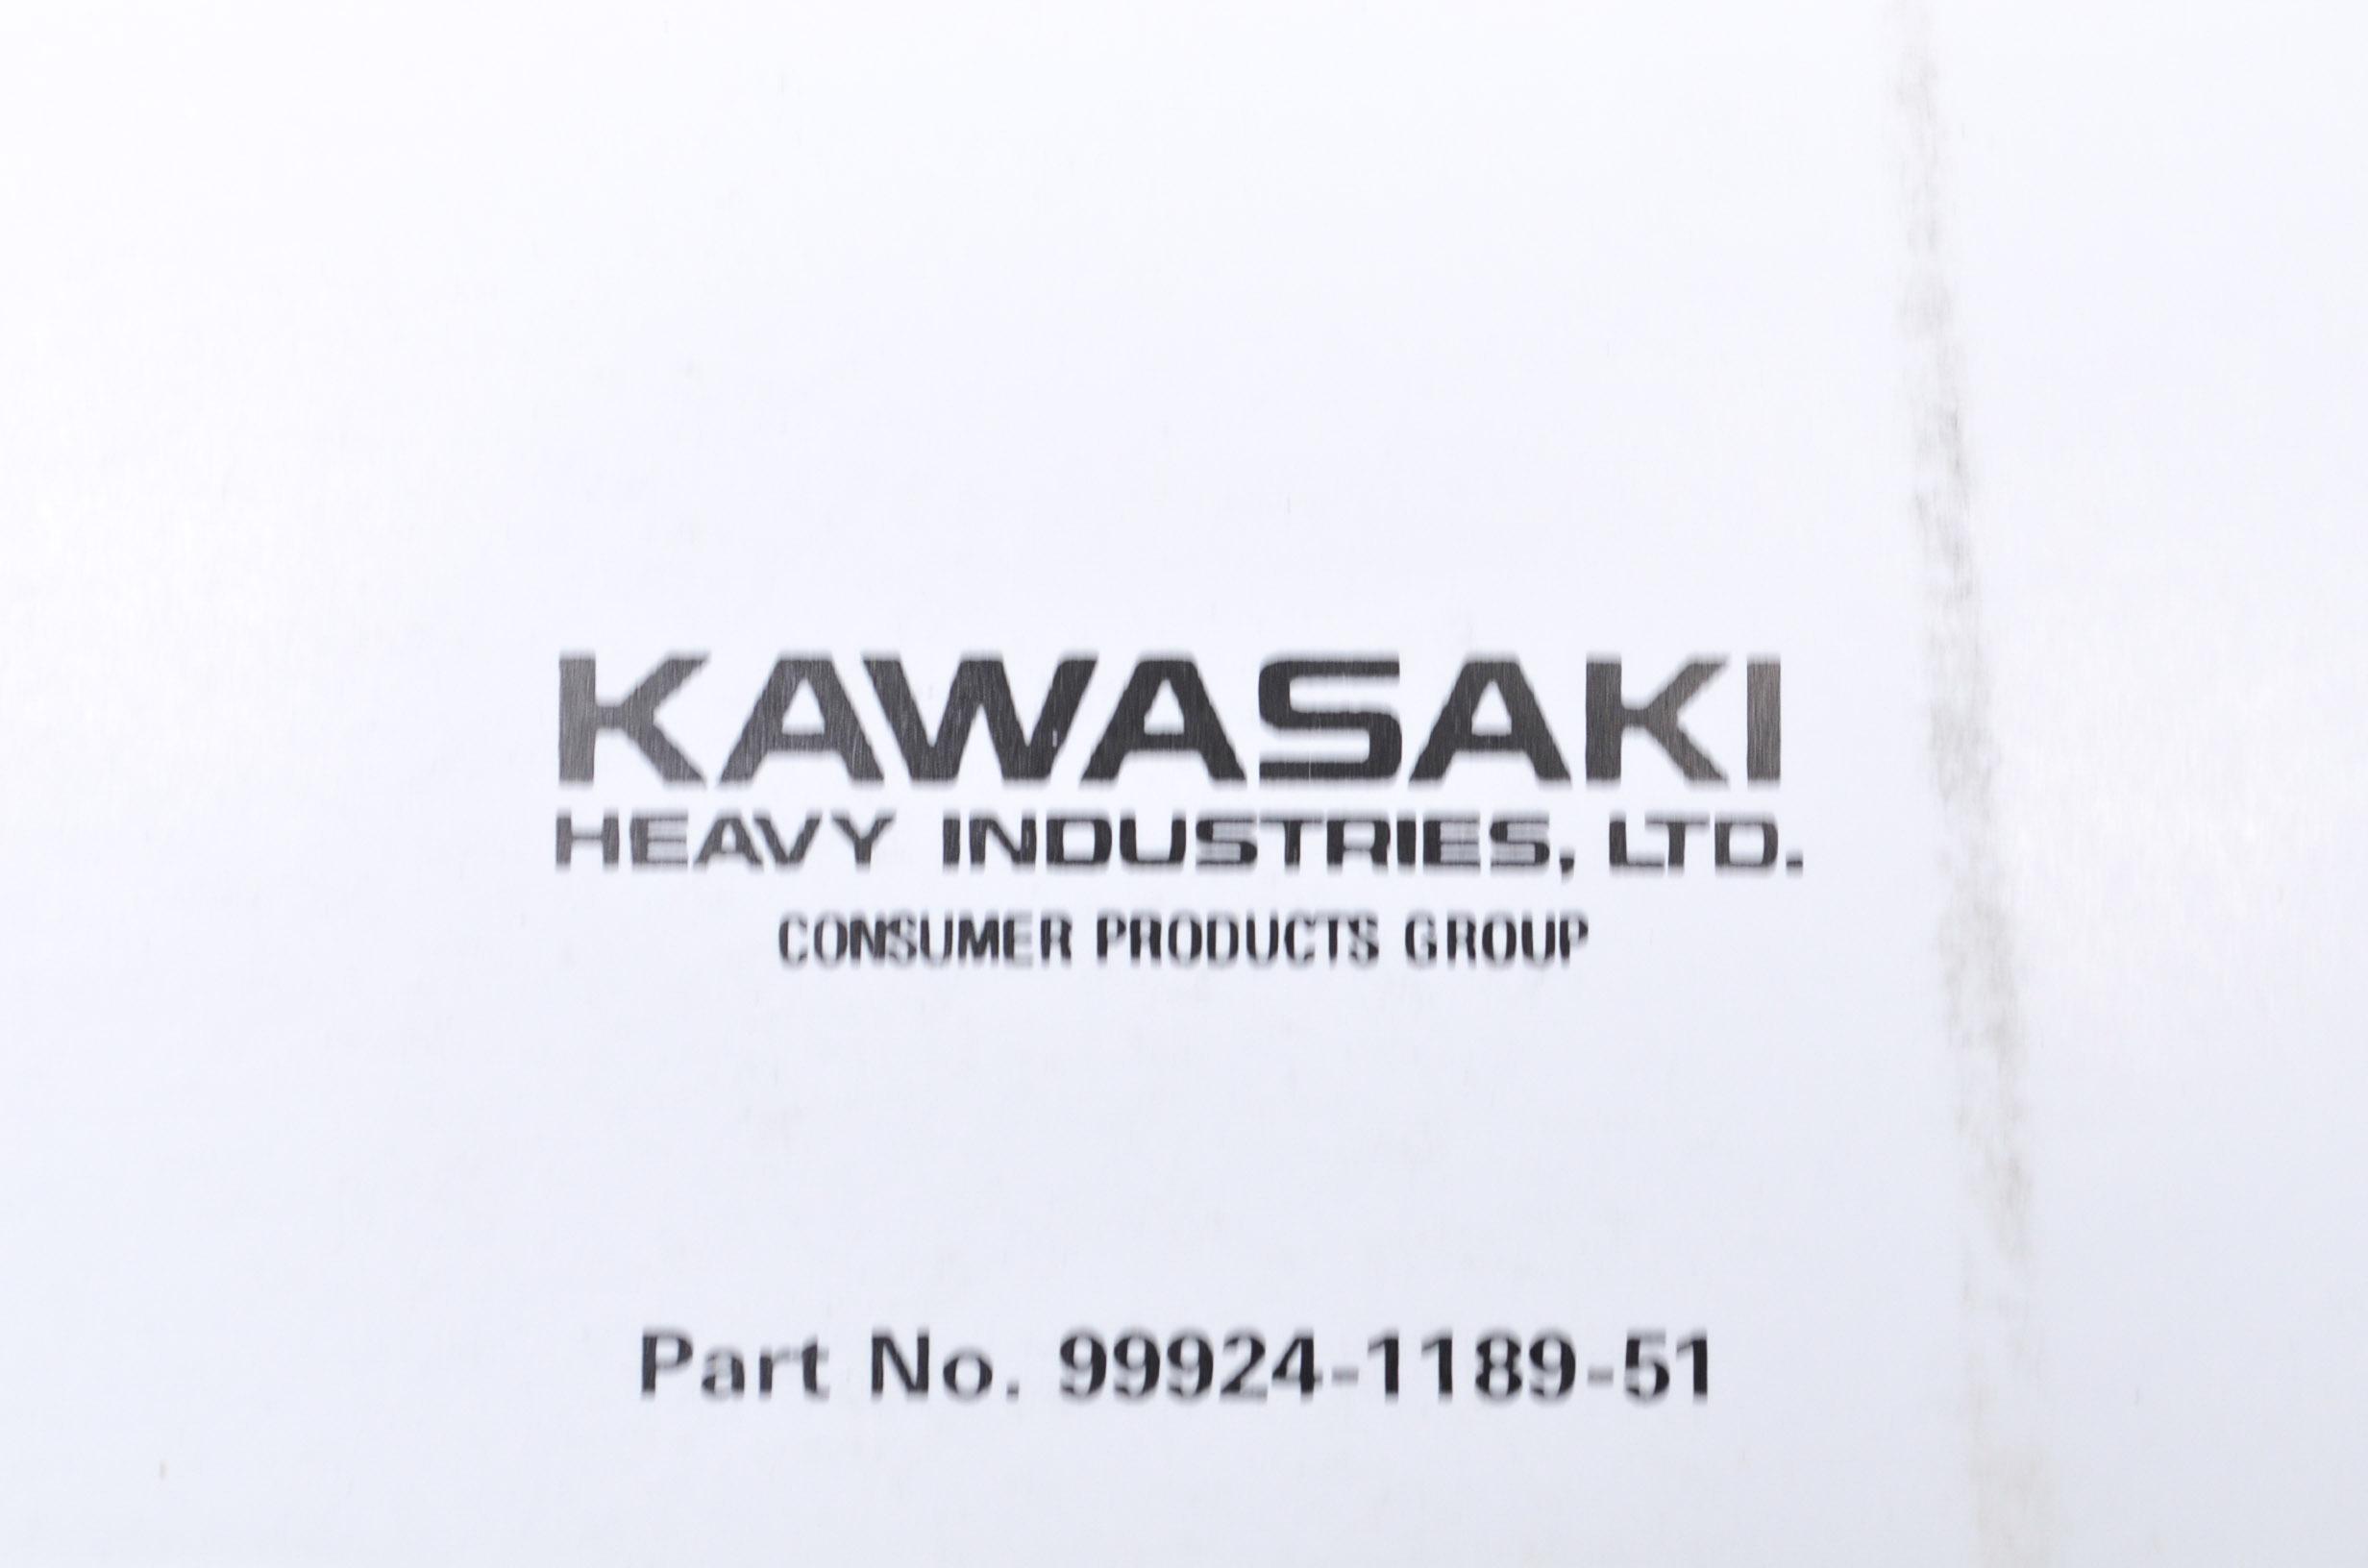 OEM Kawasaki 99924-1189-51 Service Manual Supplement